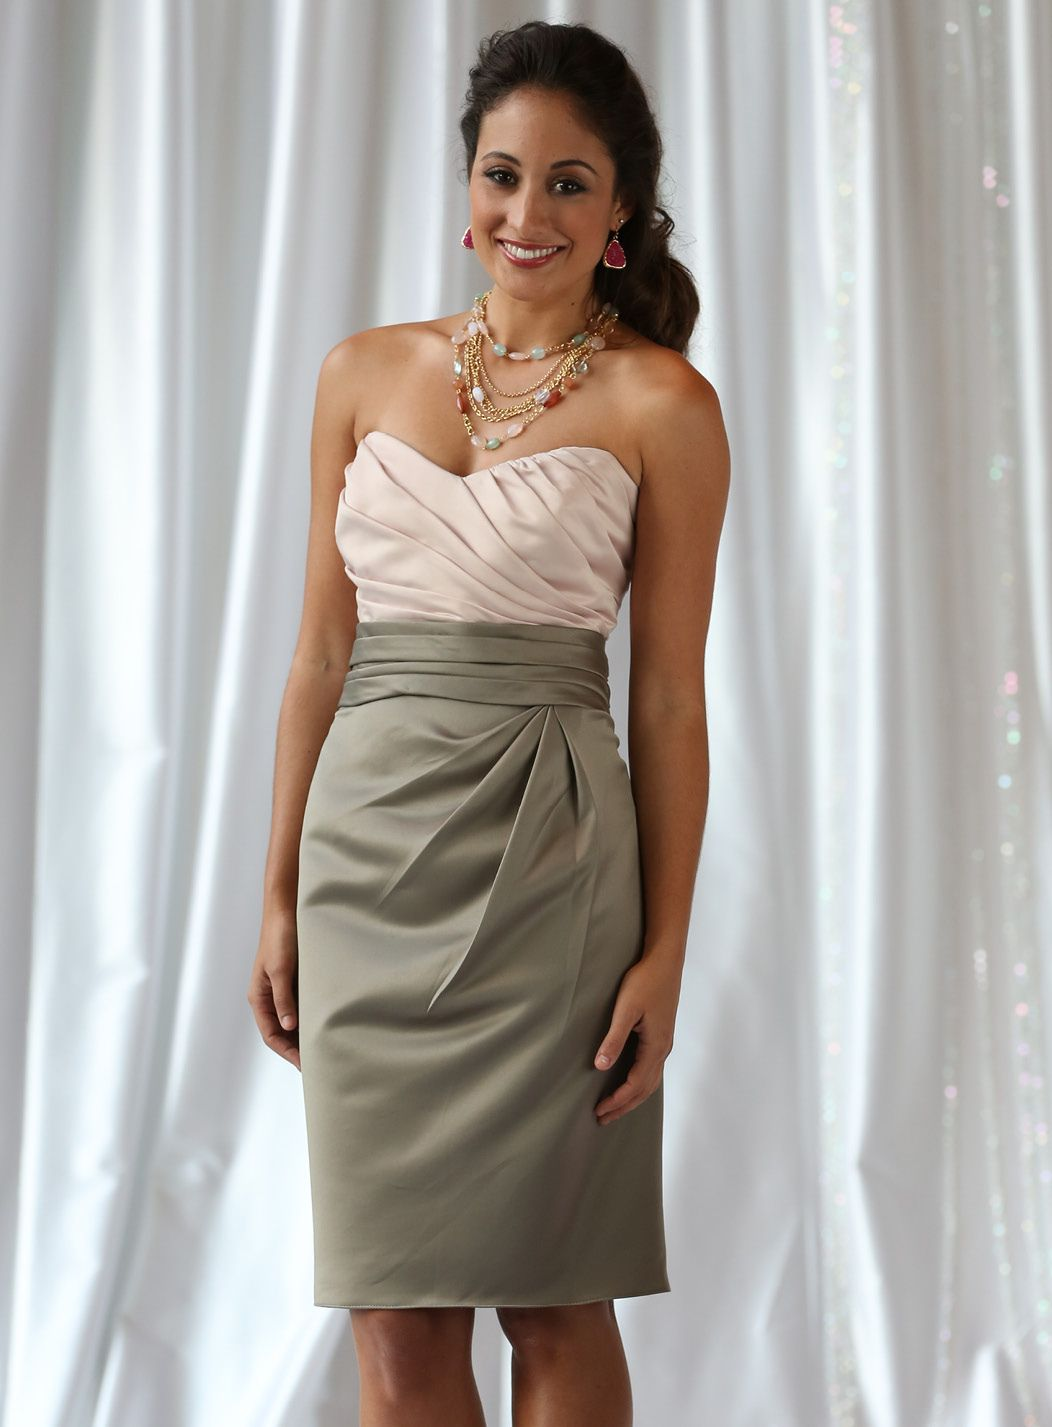 Atlanta wedding dress shops  AnyaA  Outfit Inspiration  Pinterest  Gowns Weddings and